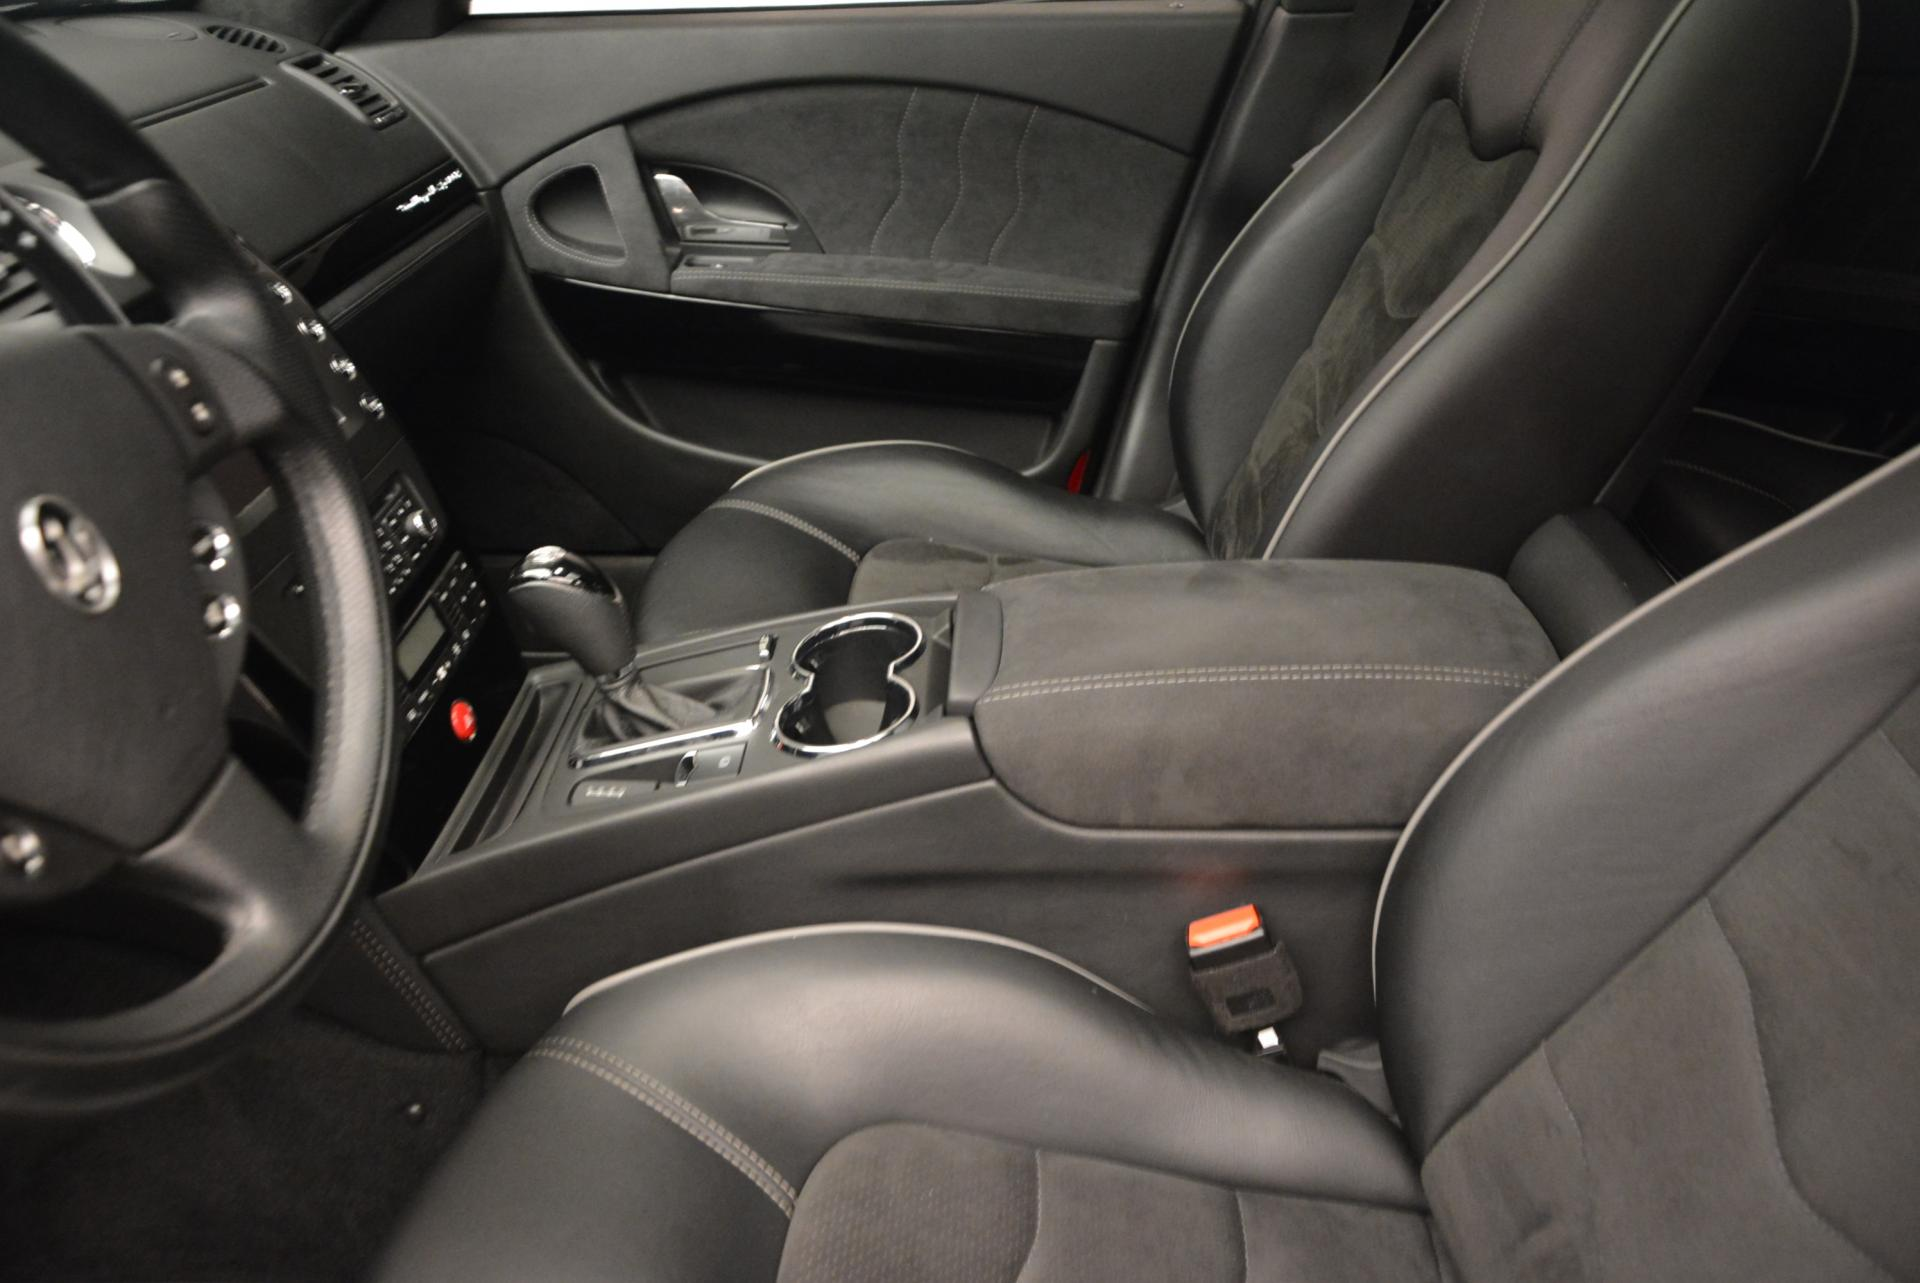 Used 2011 Maserati Quattroporte Sport GT S For Sale In Westport, CT 531_p15